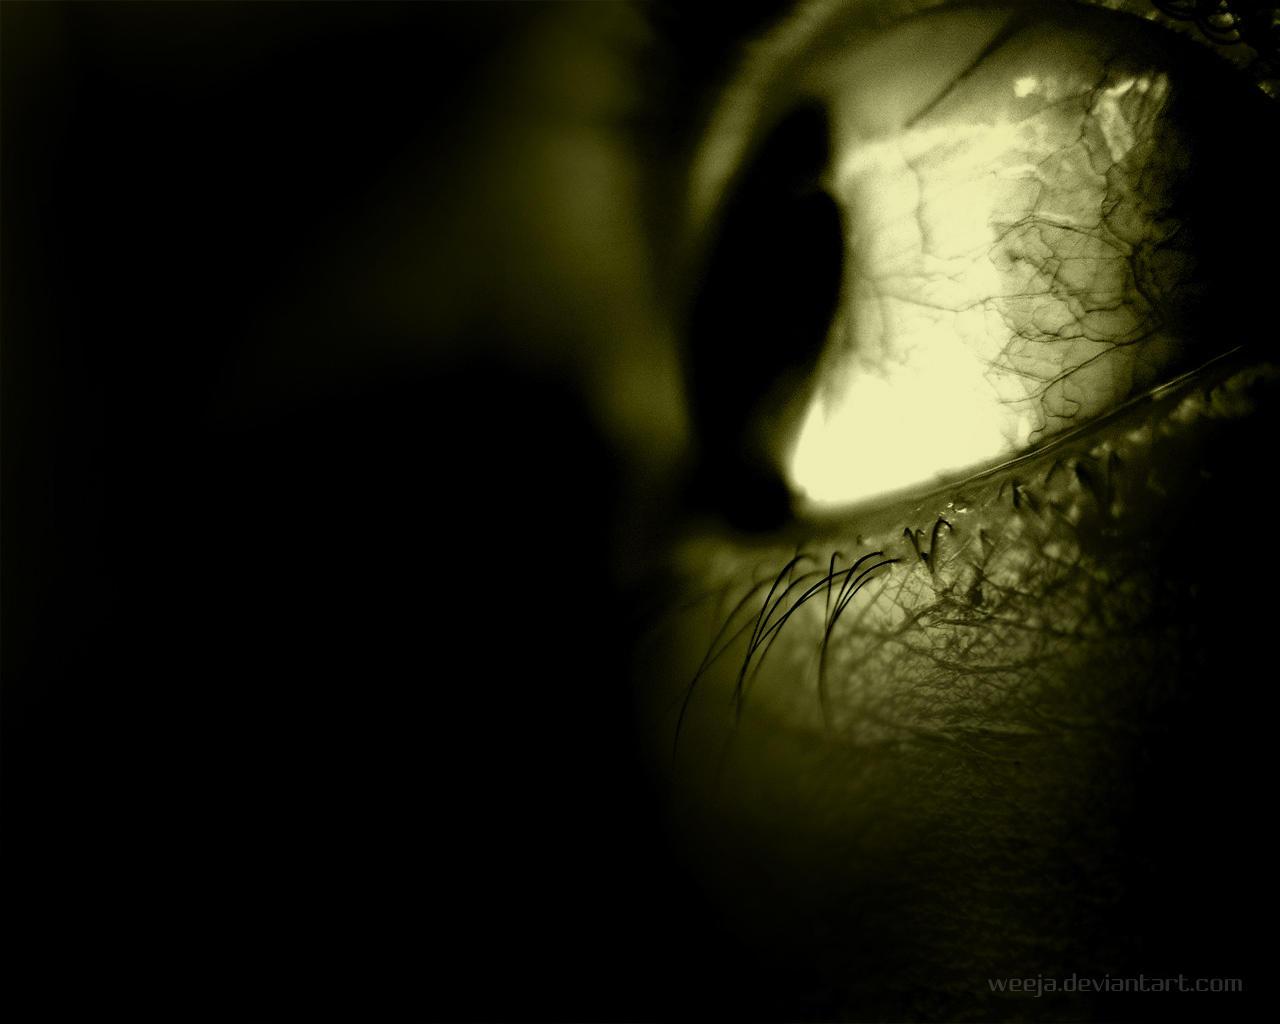 insomnia   wallpaper by weeja 34 Geniş ekran masaüstü resimler